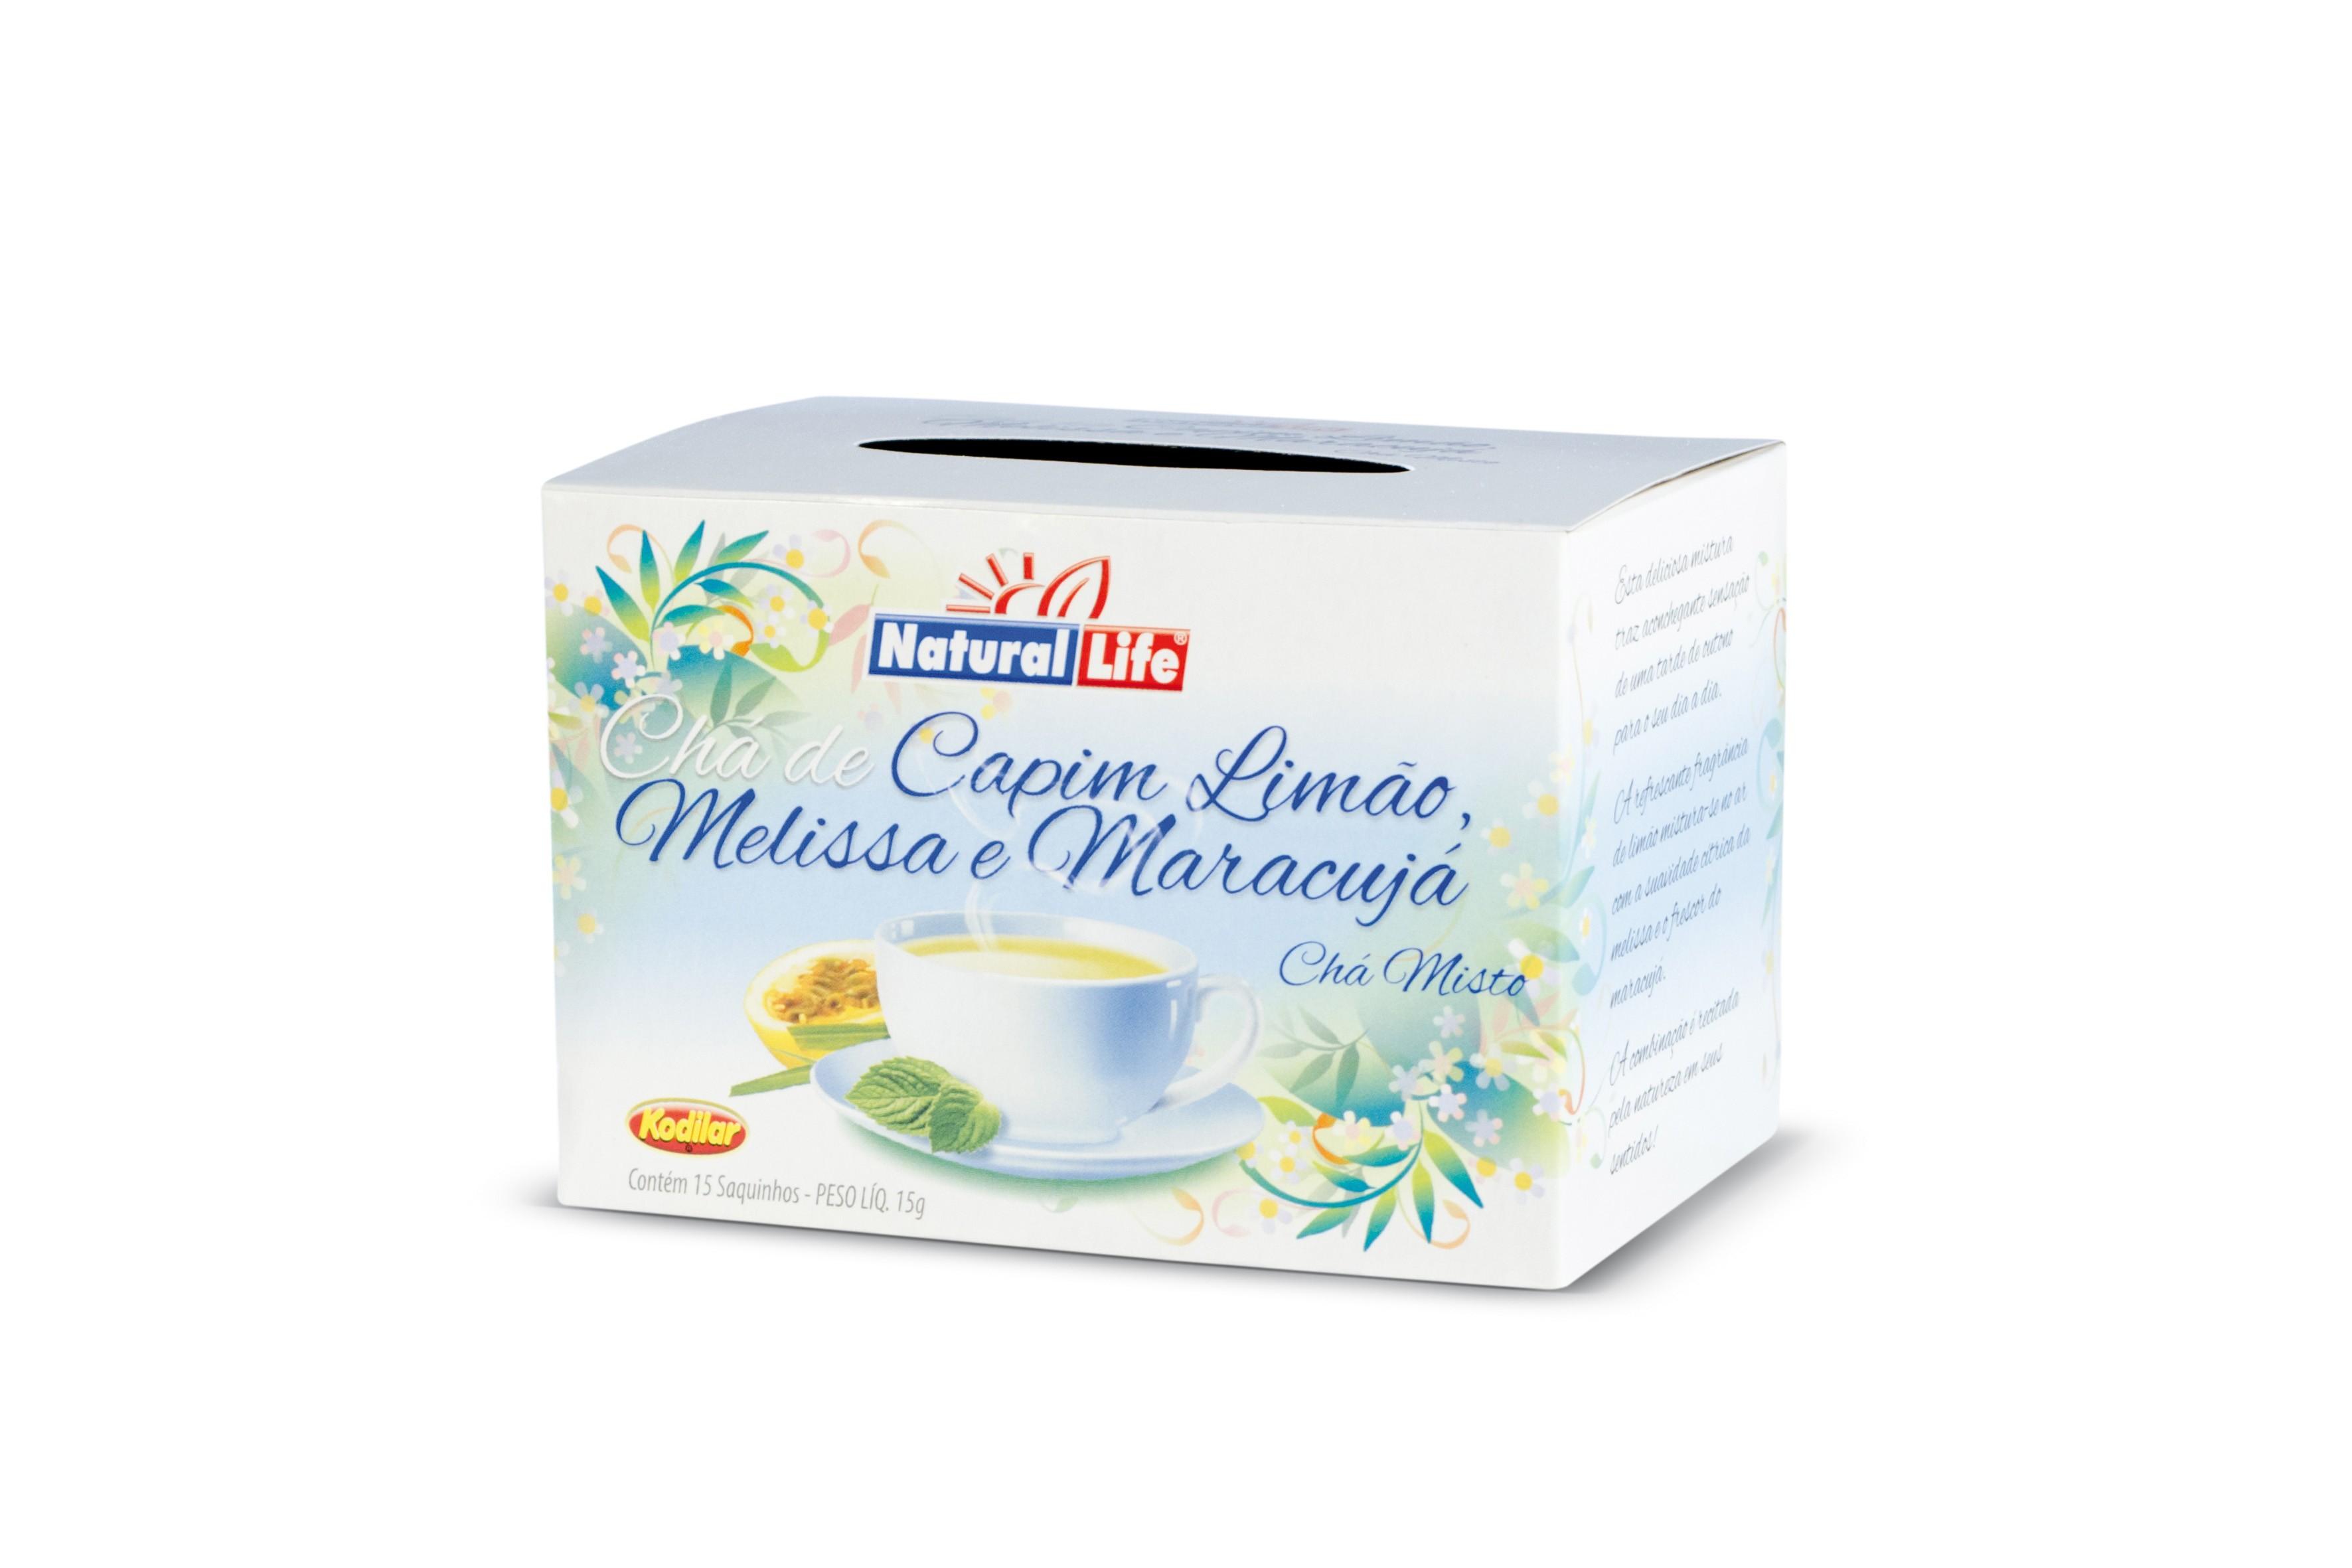 Chá Misto Capim Limão, Melissa e Maracujá (15 Sachês) Natural Life